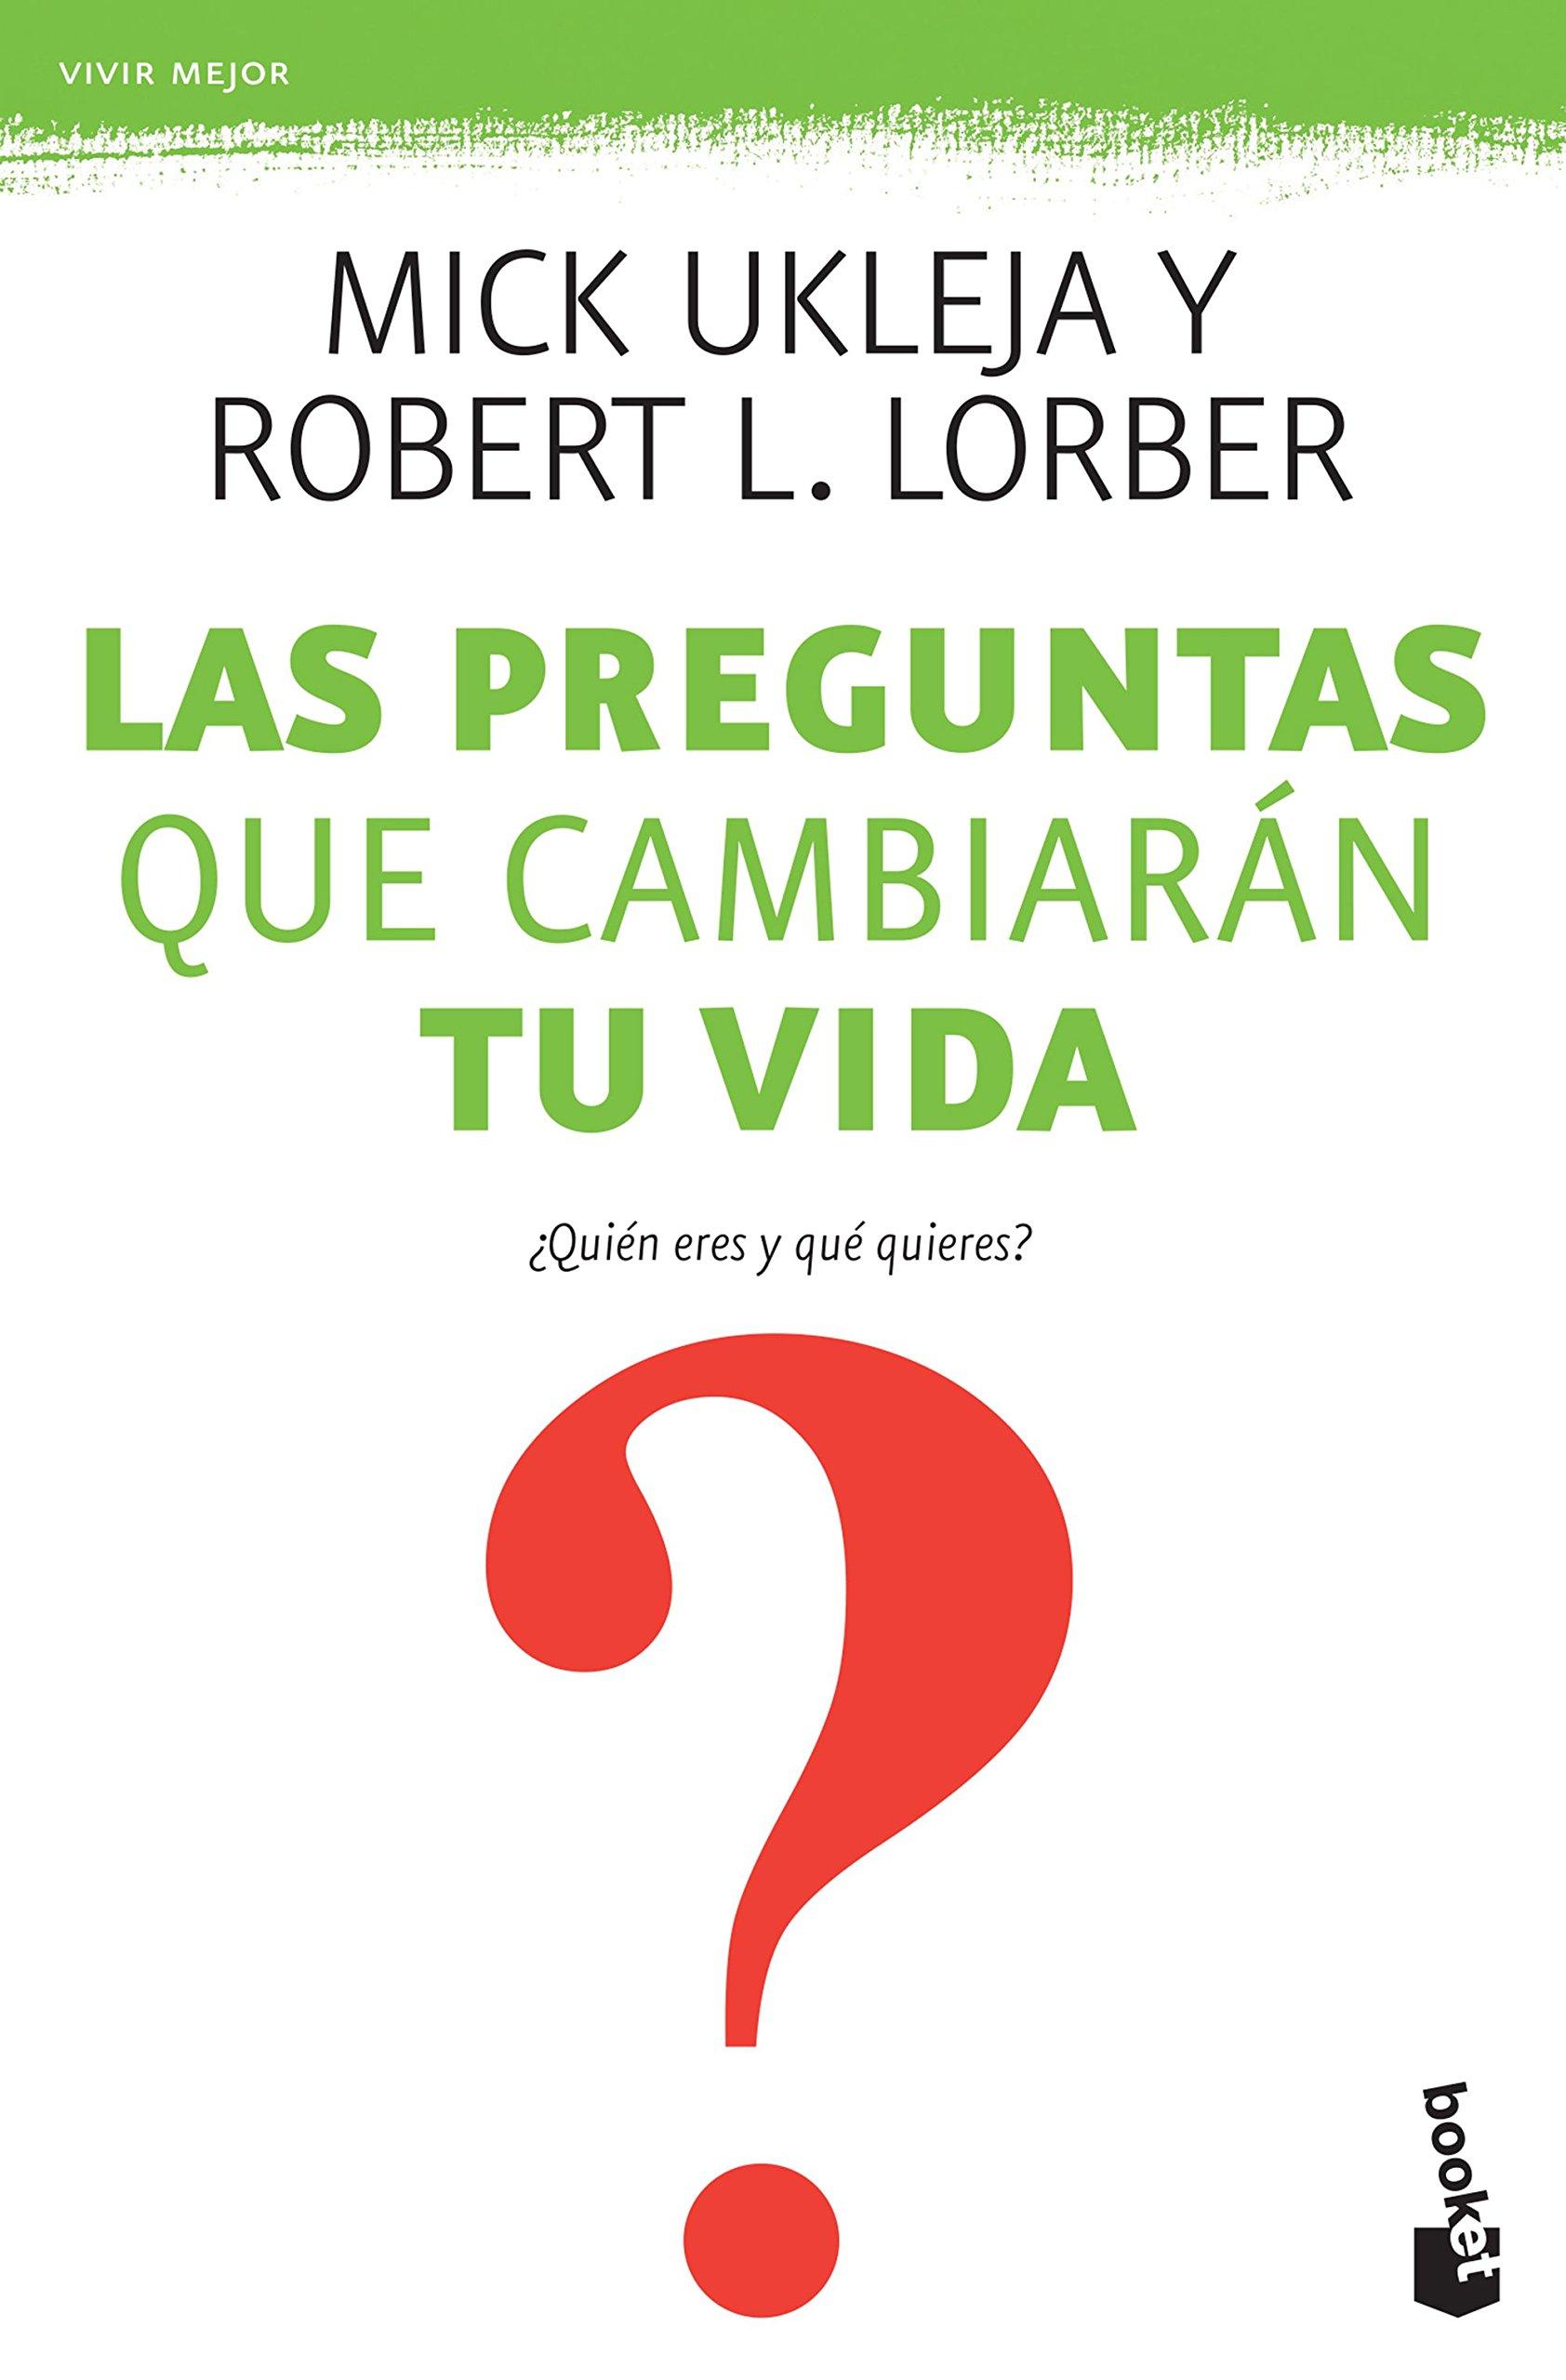 Las preguntas que cambiarán tu vida (Spanish Edition): Mick Ukleja: 9781681654256: Amazon.com: Books